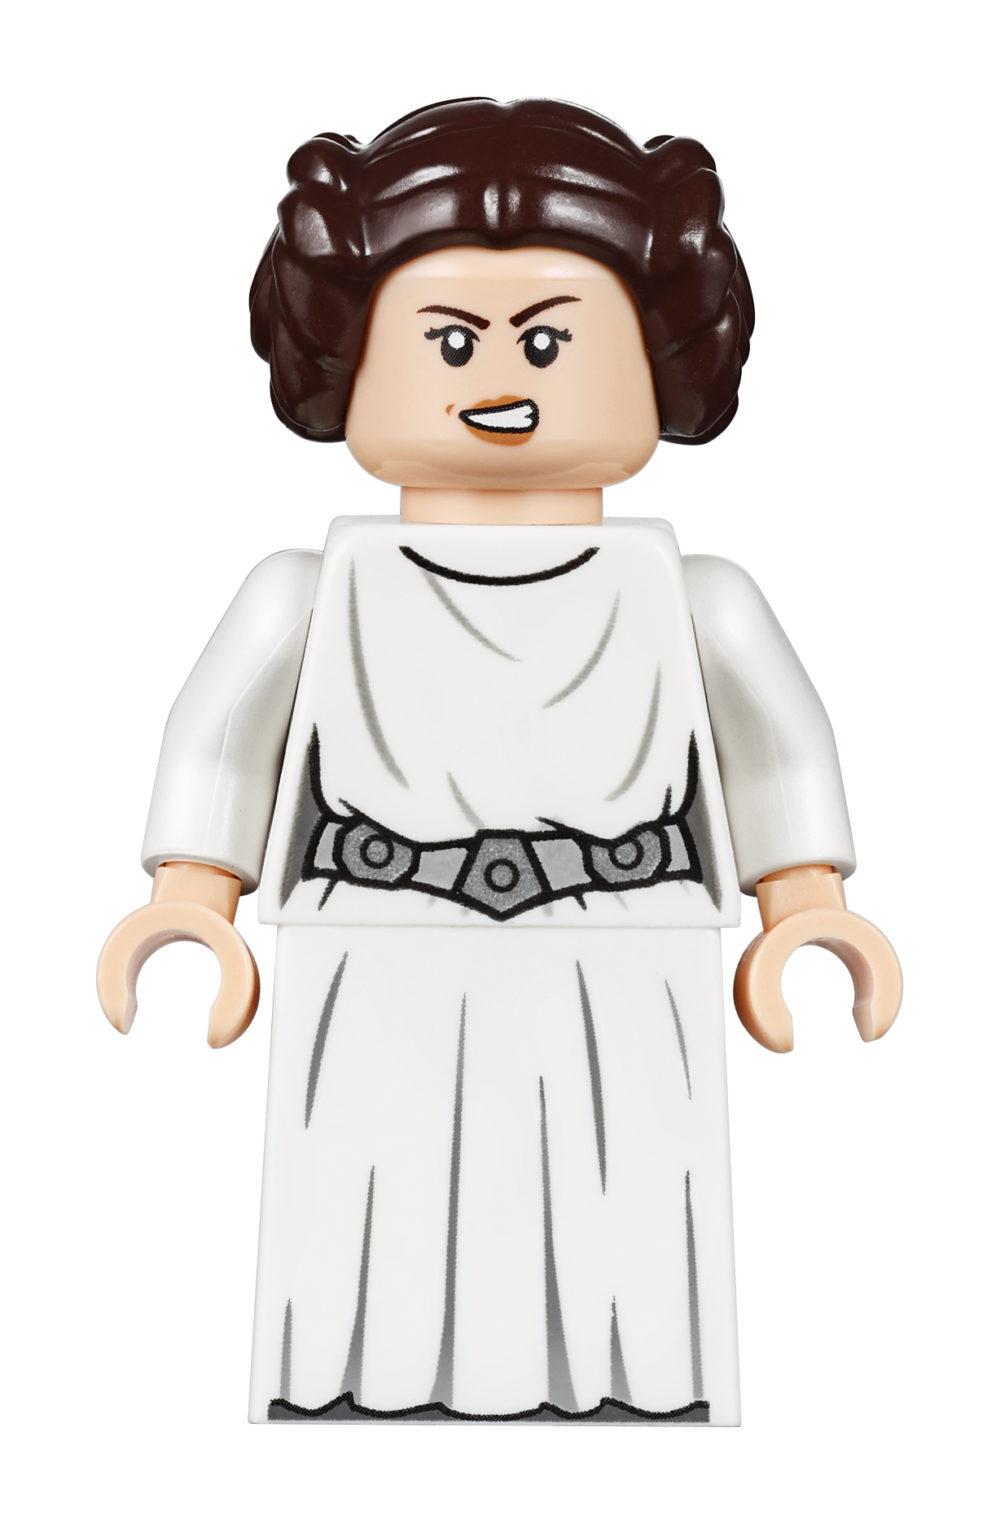 LEGO Star Wars 75244 - Princess Leia